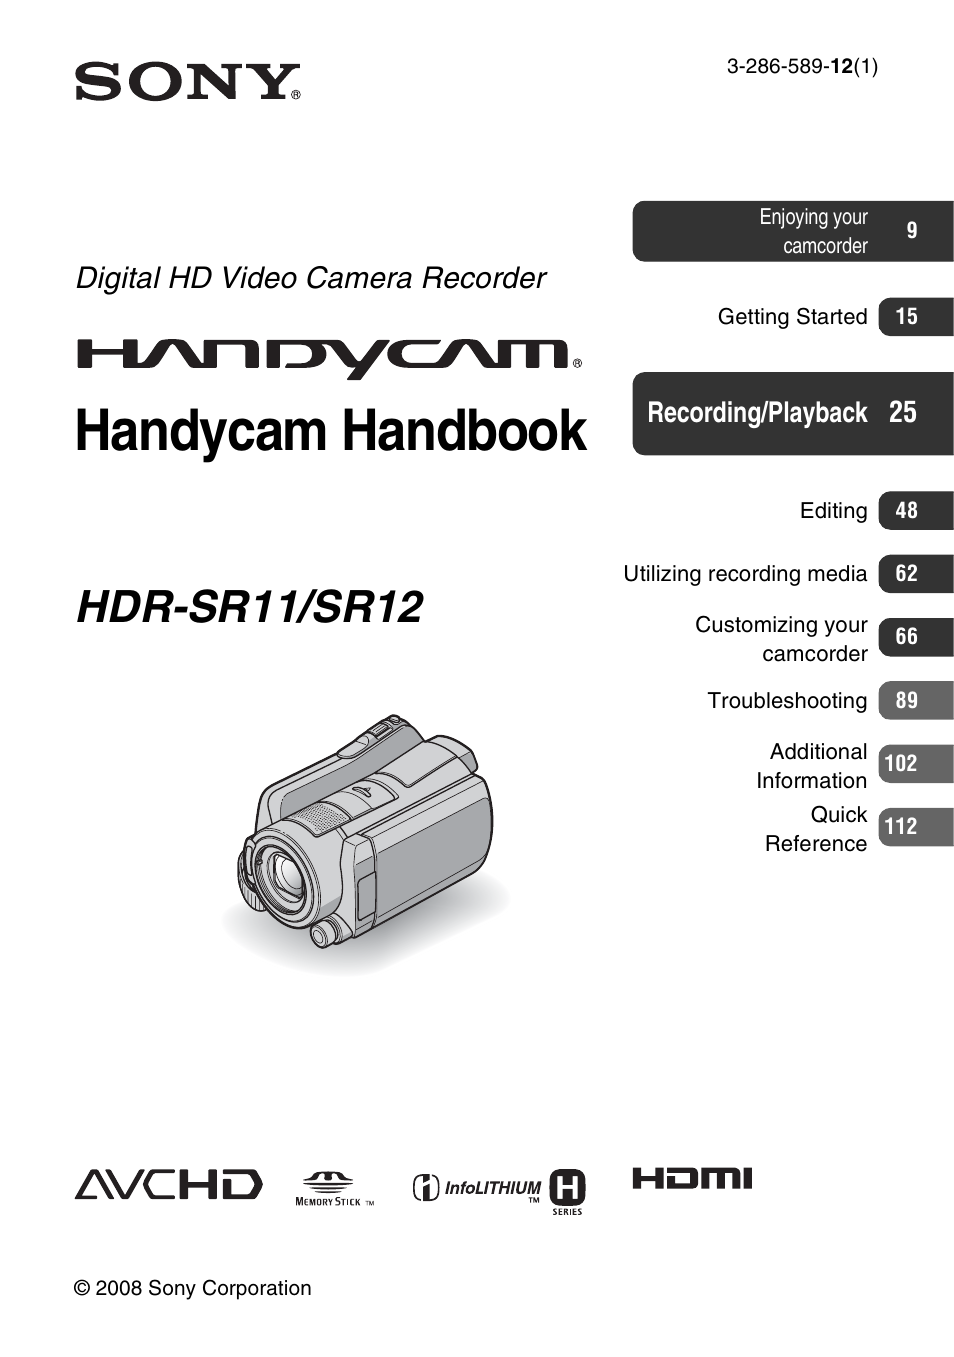 sony hdr sr11 user manual 124 pages also for hdr sr12 rh manualsdir com sony handycam avchd user manual sony handycam hi8 instruction manual